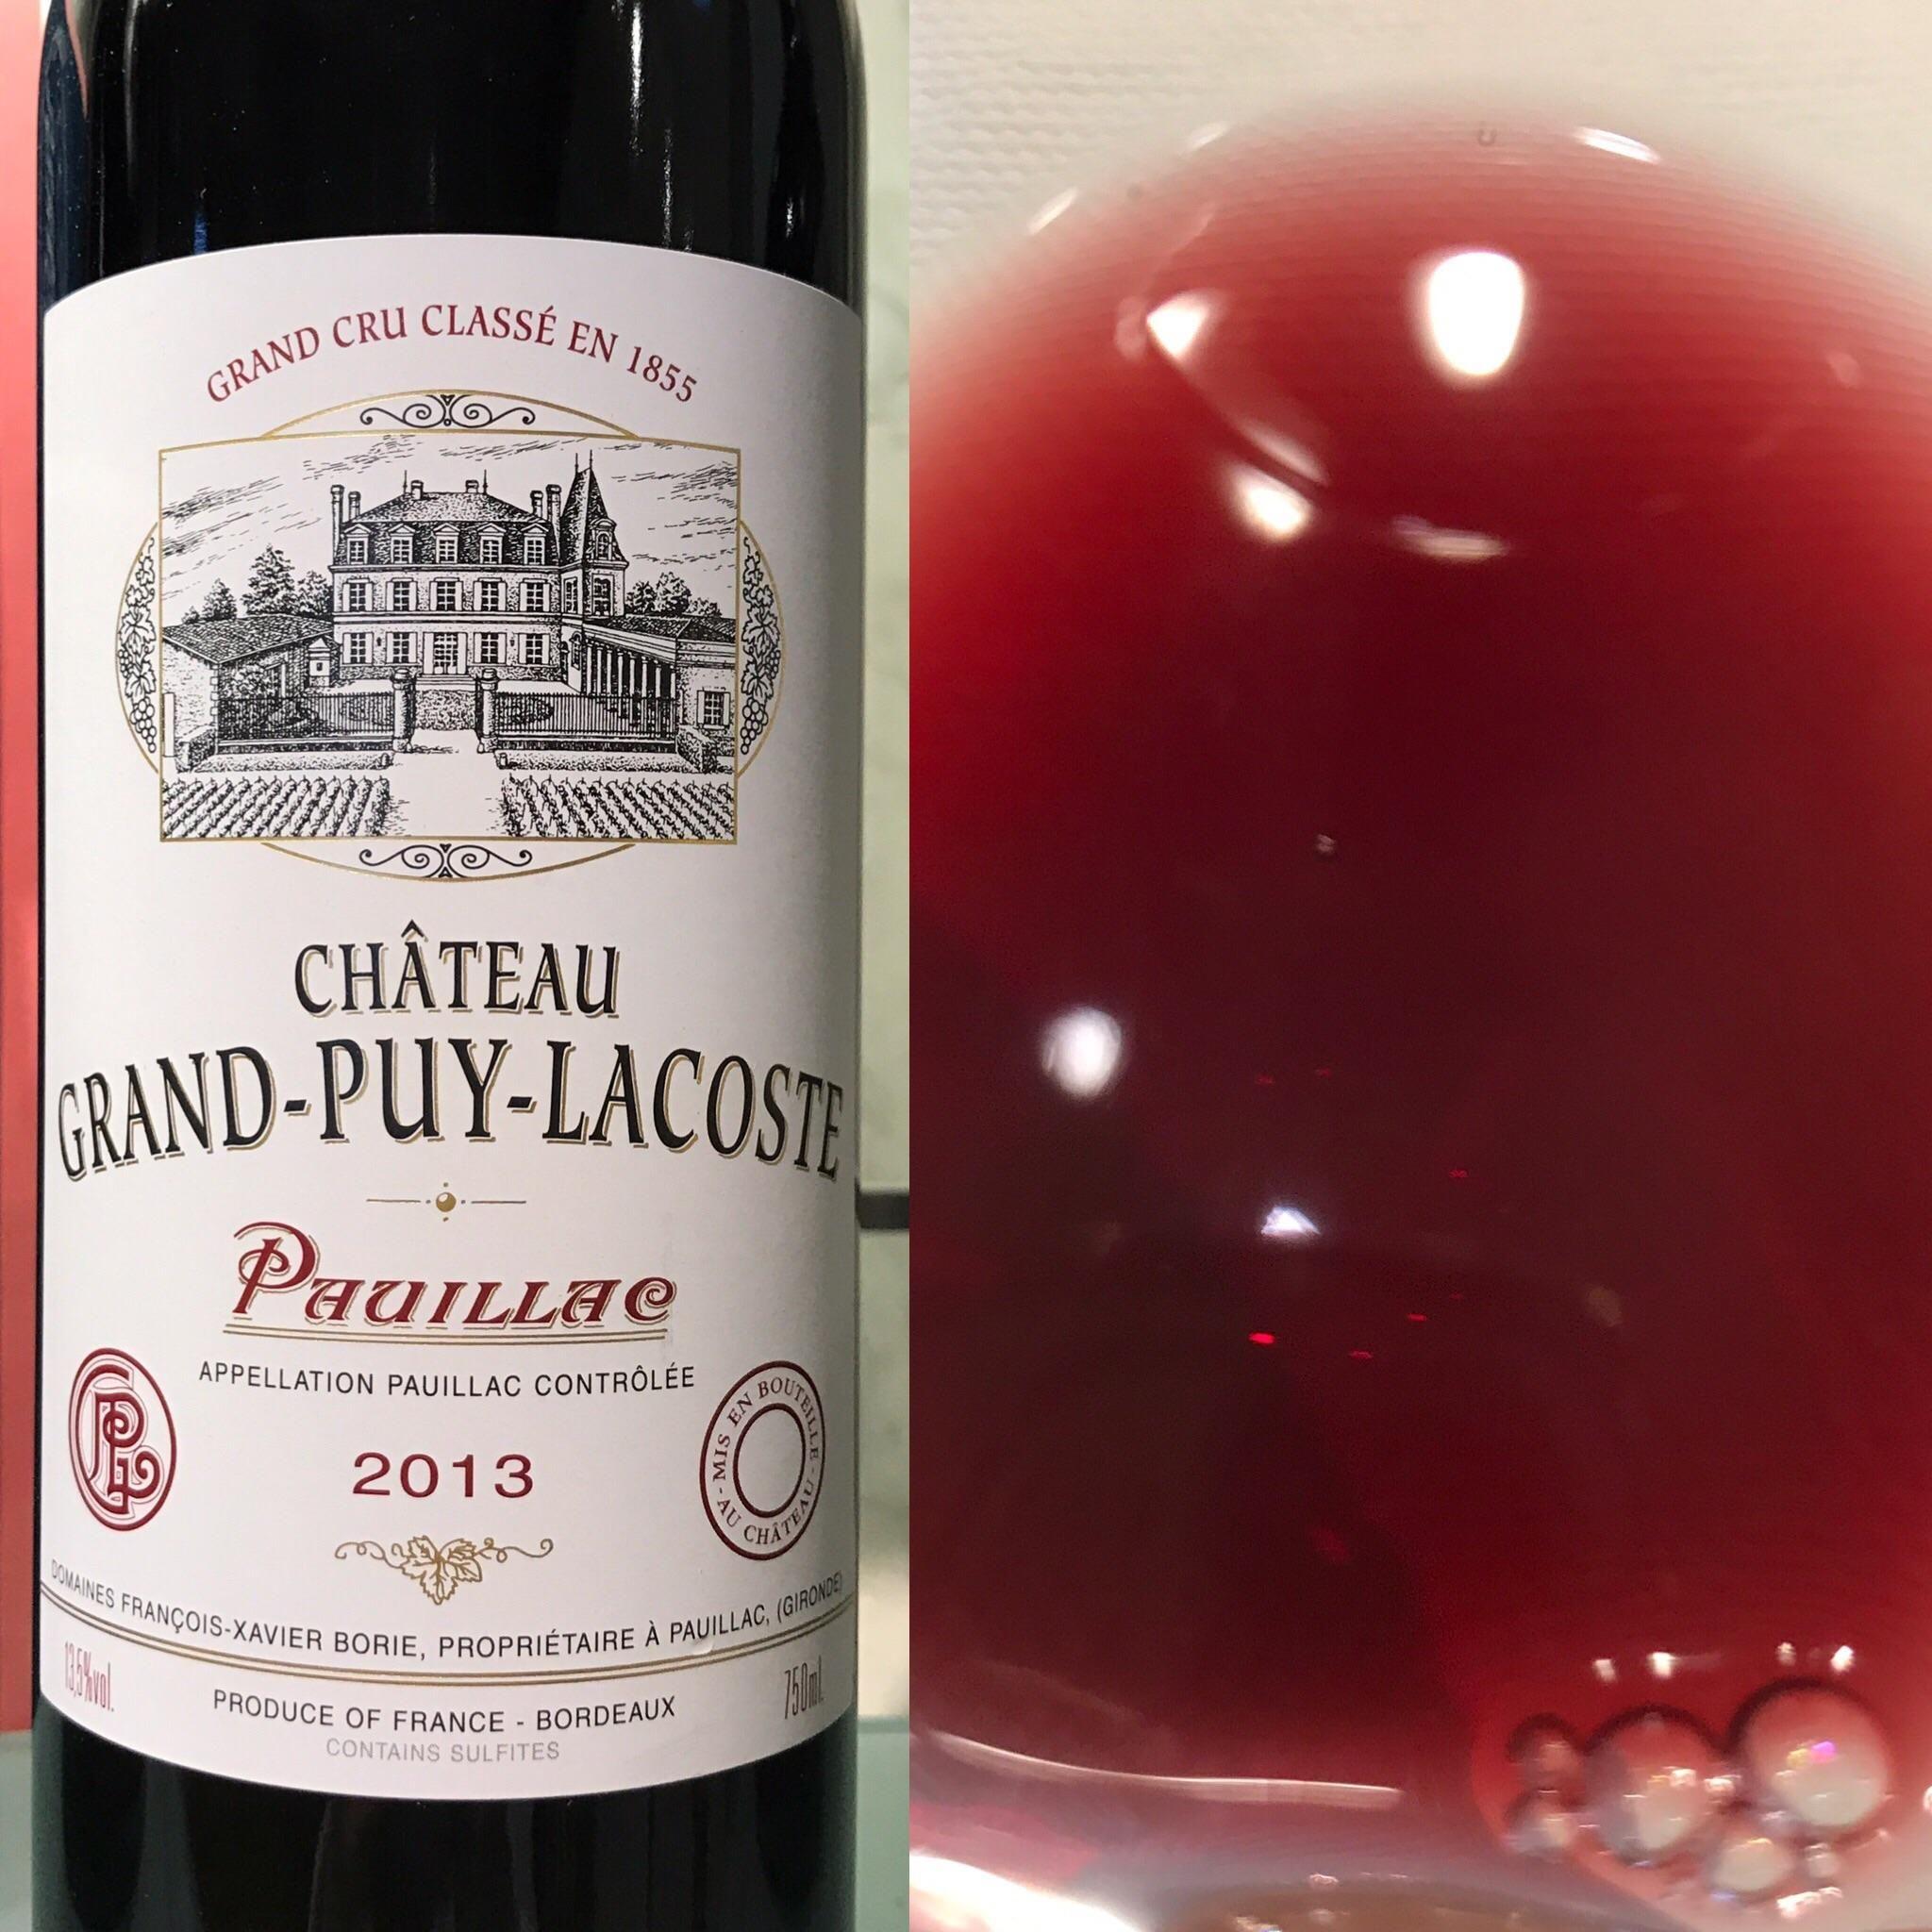 Chateau Grand Puy Lacoste Pauillac Grand Cru Classe 2013 Wine Winelover Tips Vino Winewednesday Winelovers Italy Wine Bottle Wine Lovers Cru